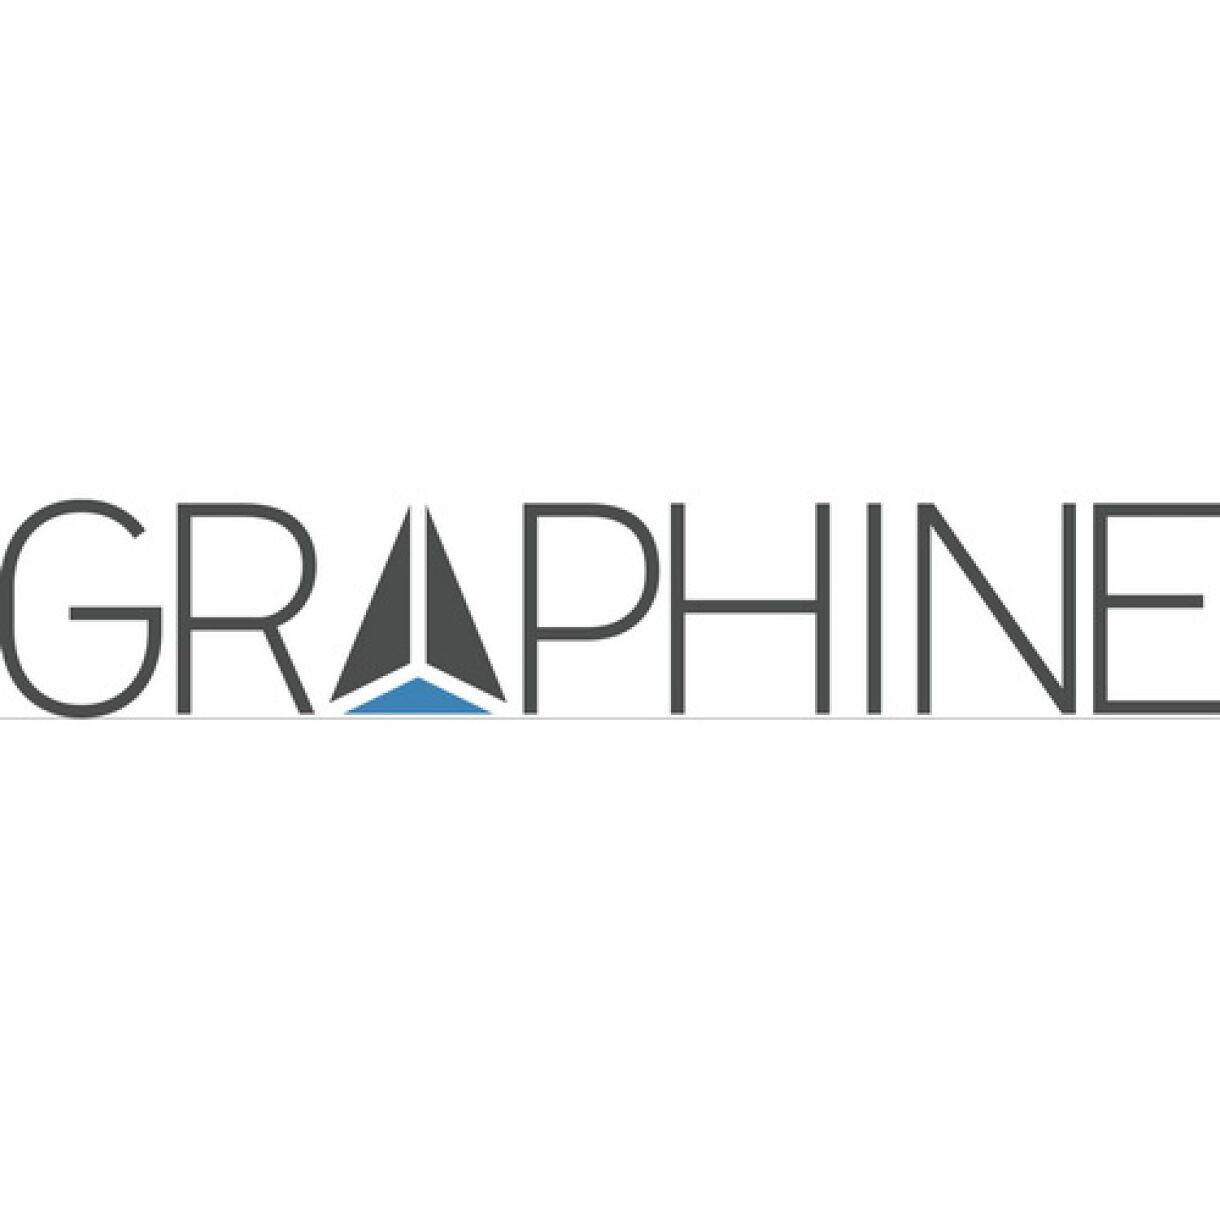 Granite SDK 3.0 is out!